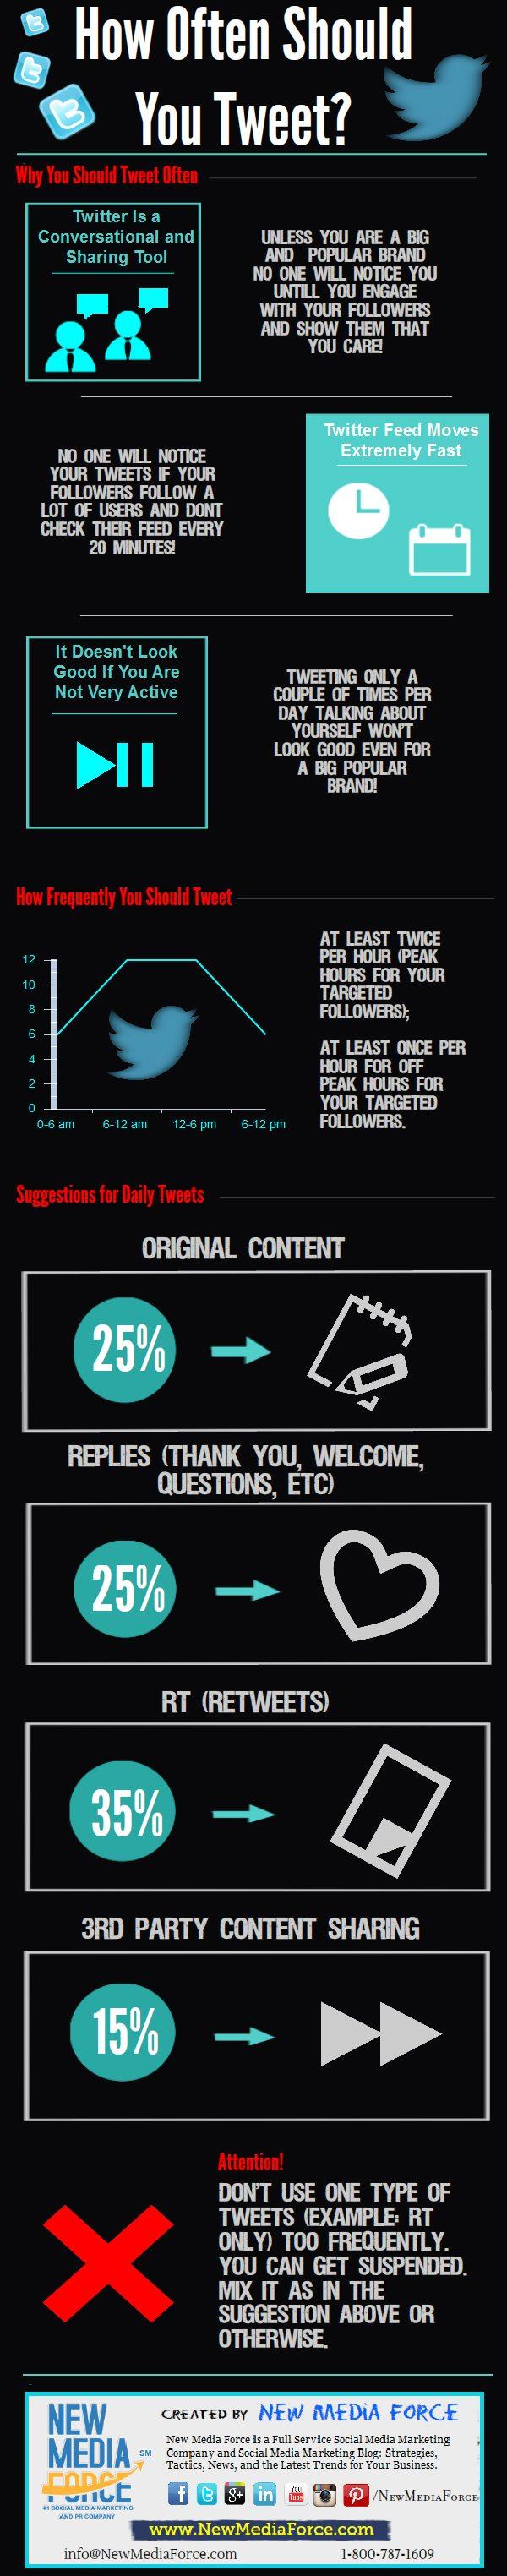 How Often You Should Tweet for a Superstar Twitter Presence